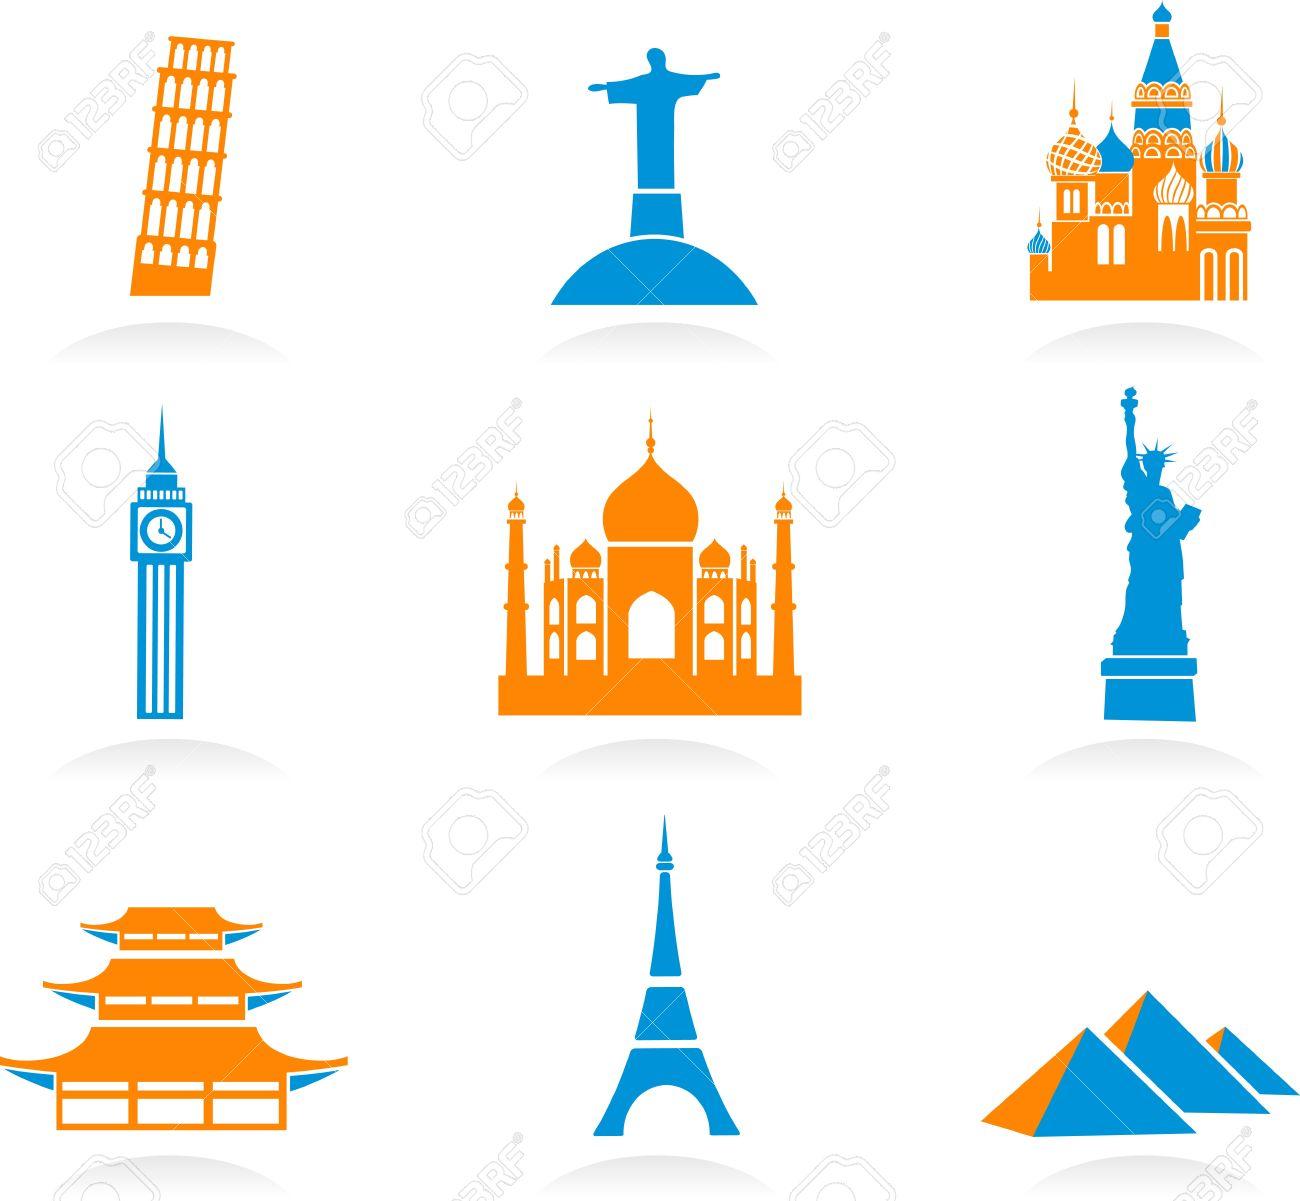 Icon Set With Famous International Historical Landmark Monuments.